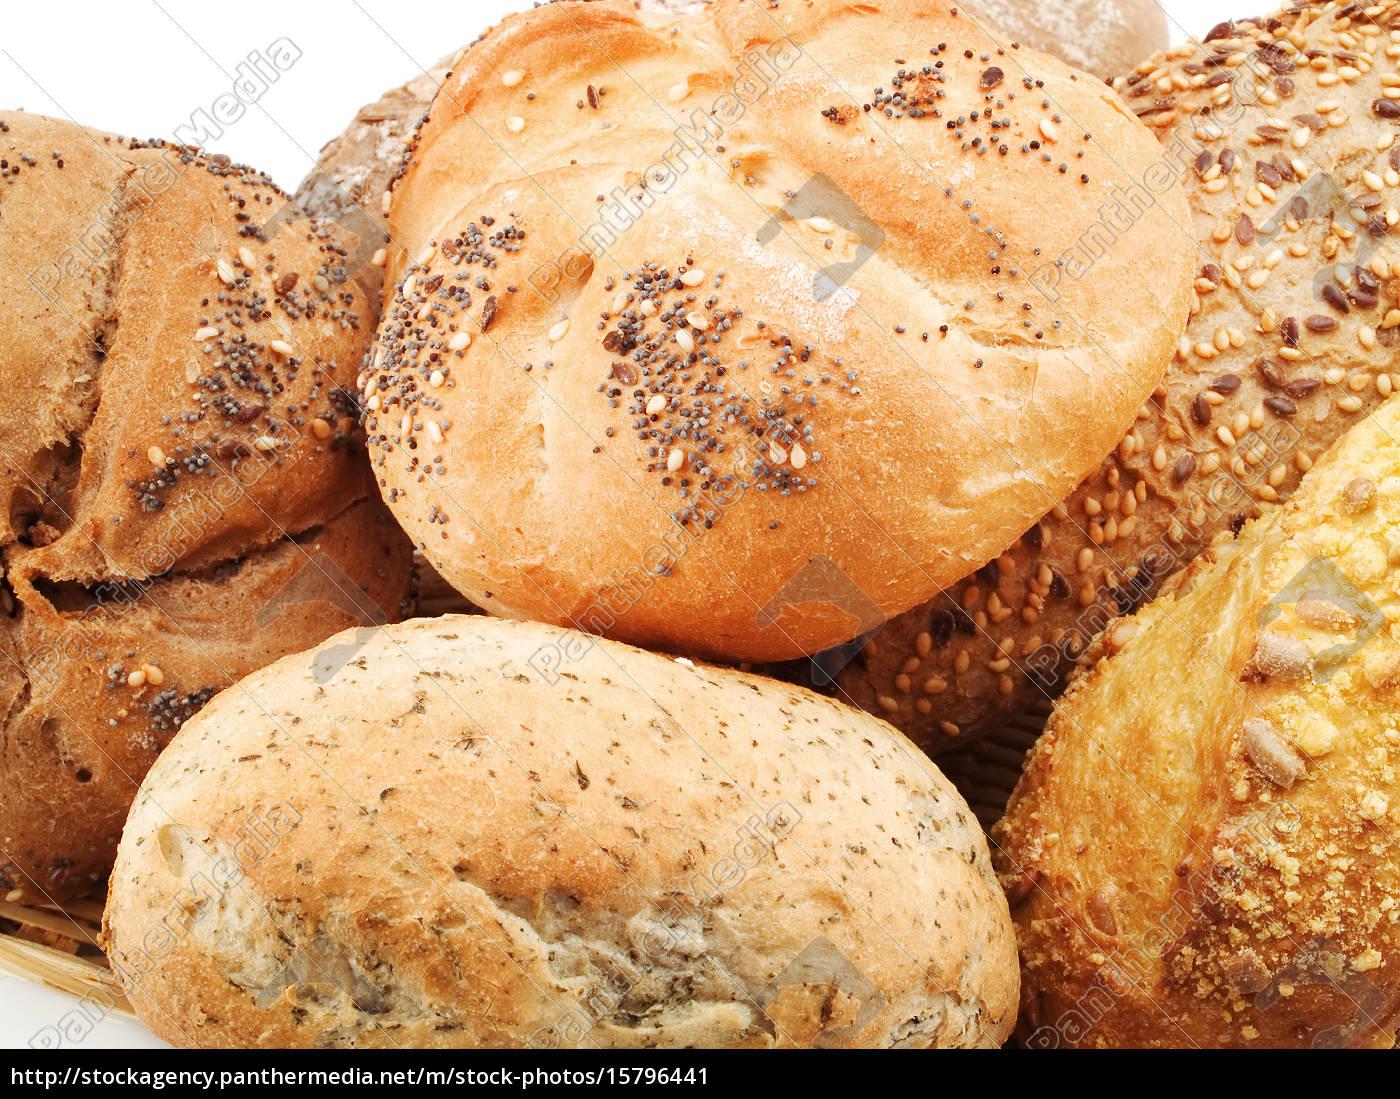 fresh, bread, fresh, bread, fresh, bread, fresh, bread, fresh, bread, fresh - 15796441